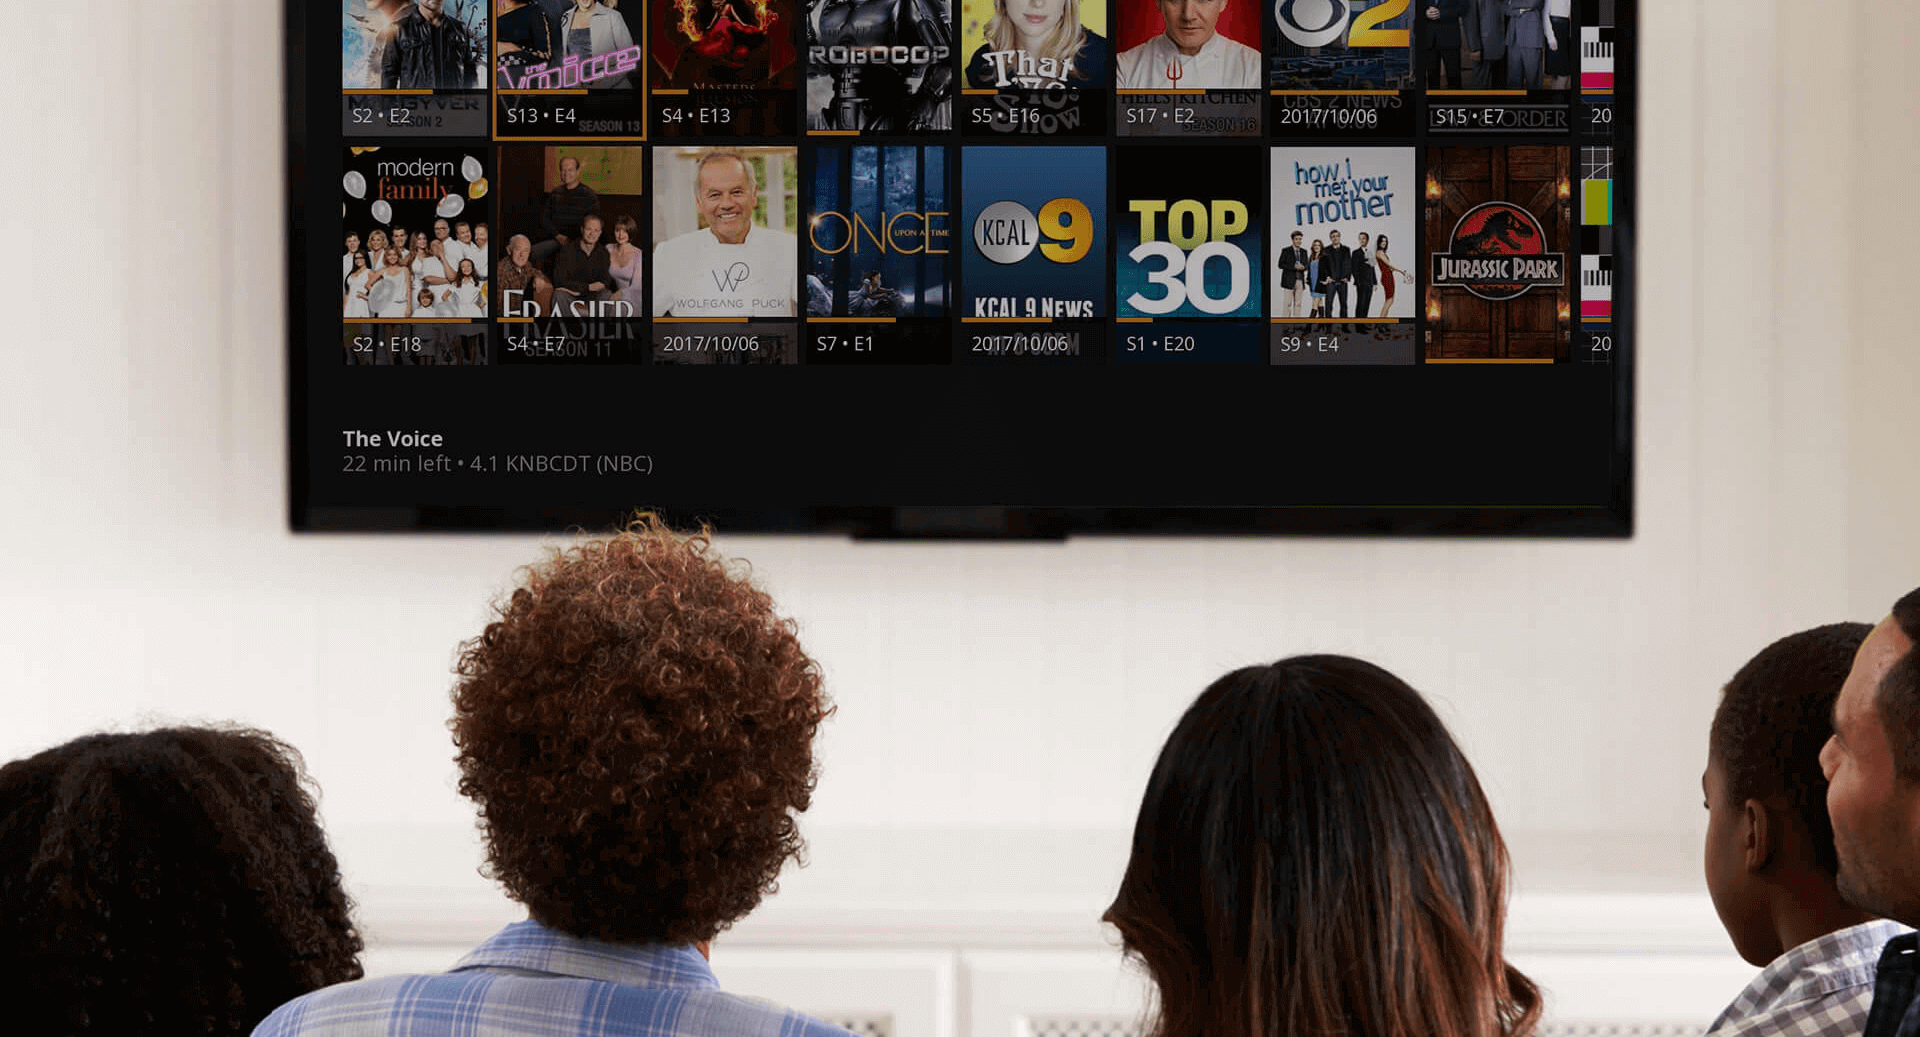 Plex Live TV for Roku comes out: Watch, pause, rewind live TV